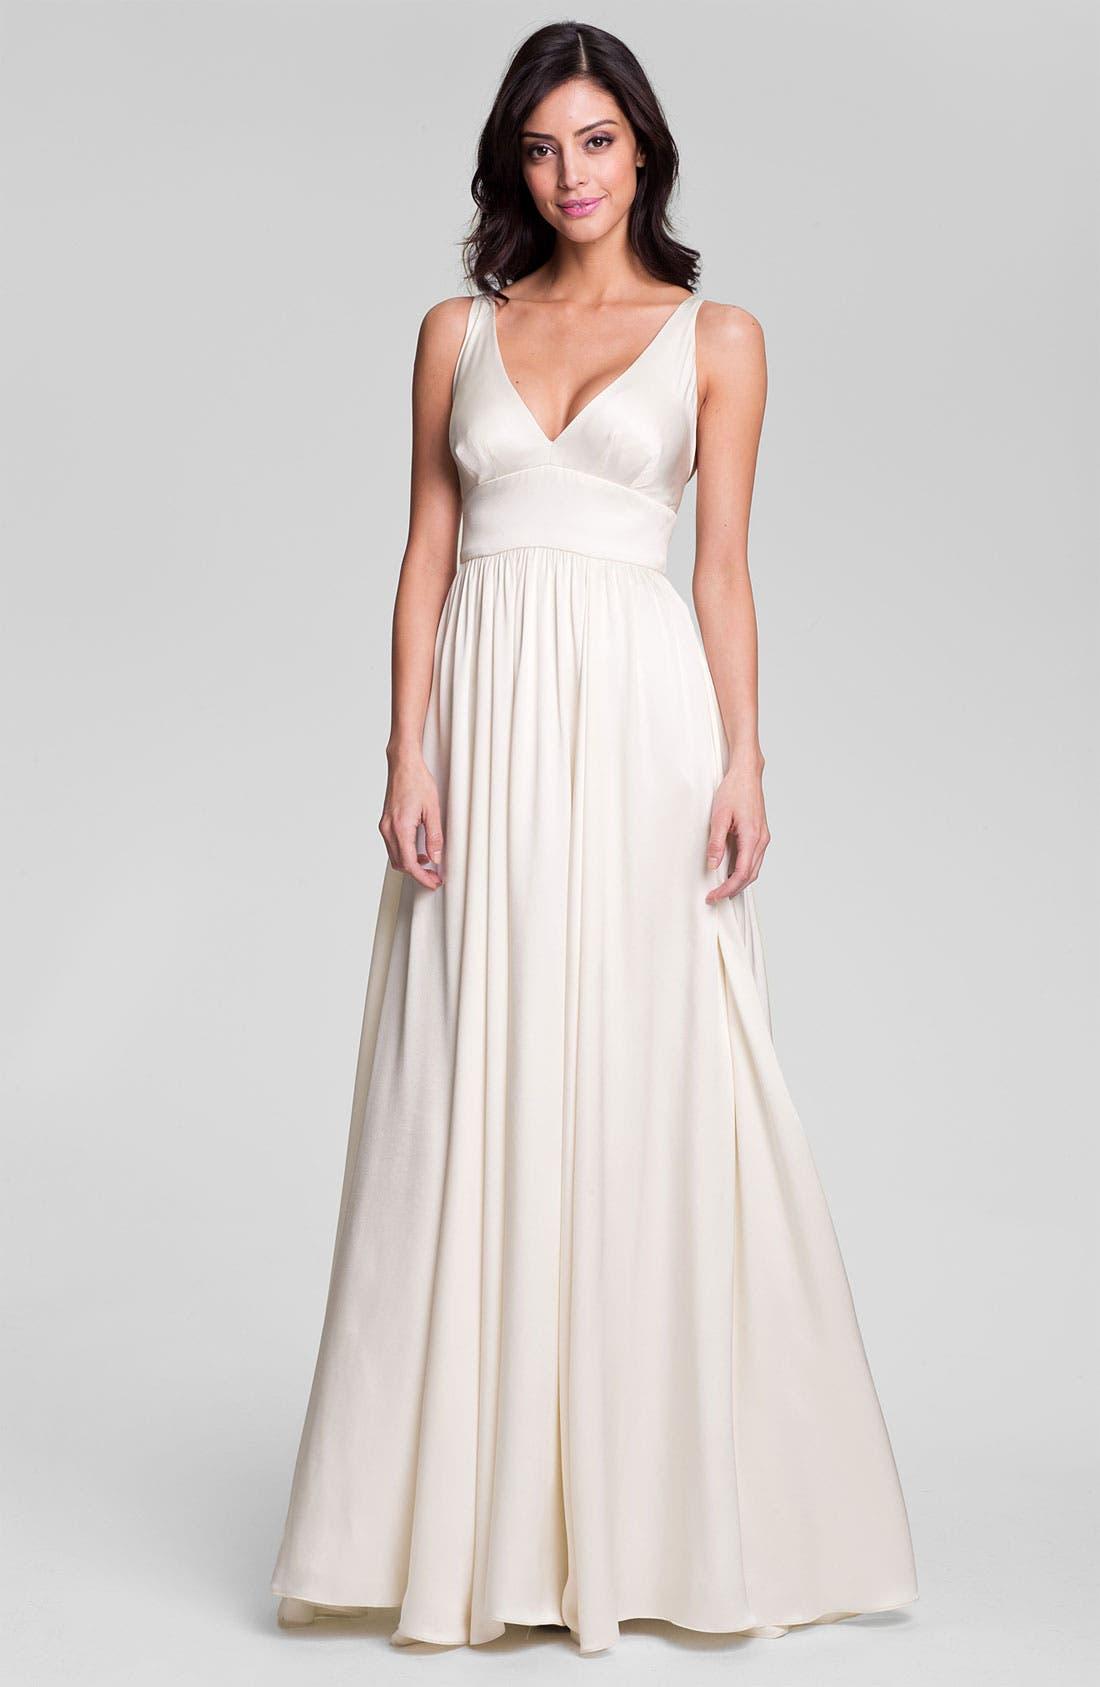 Main Image - Nicole Miller 'Elizabeth' Crisscrossed Back Silk A-Line Gown